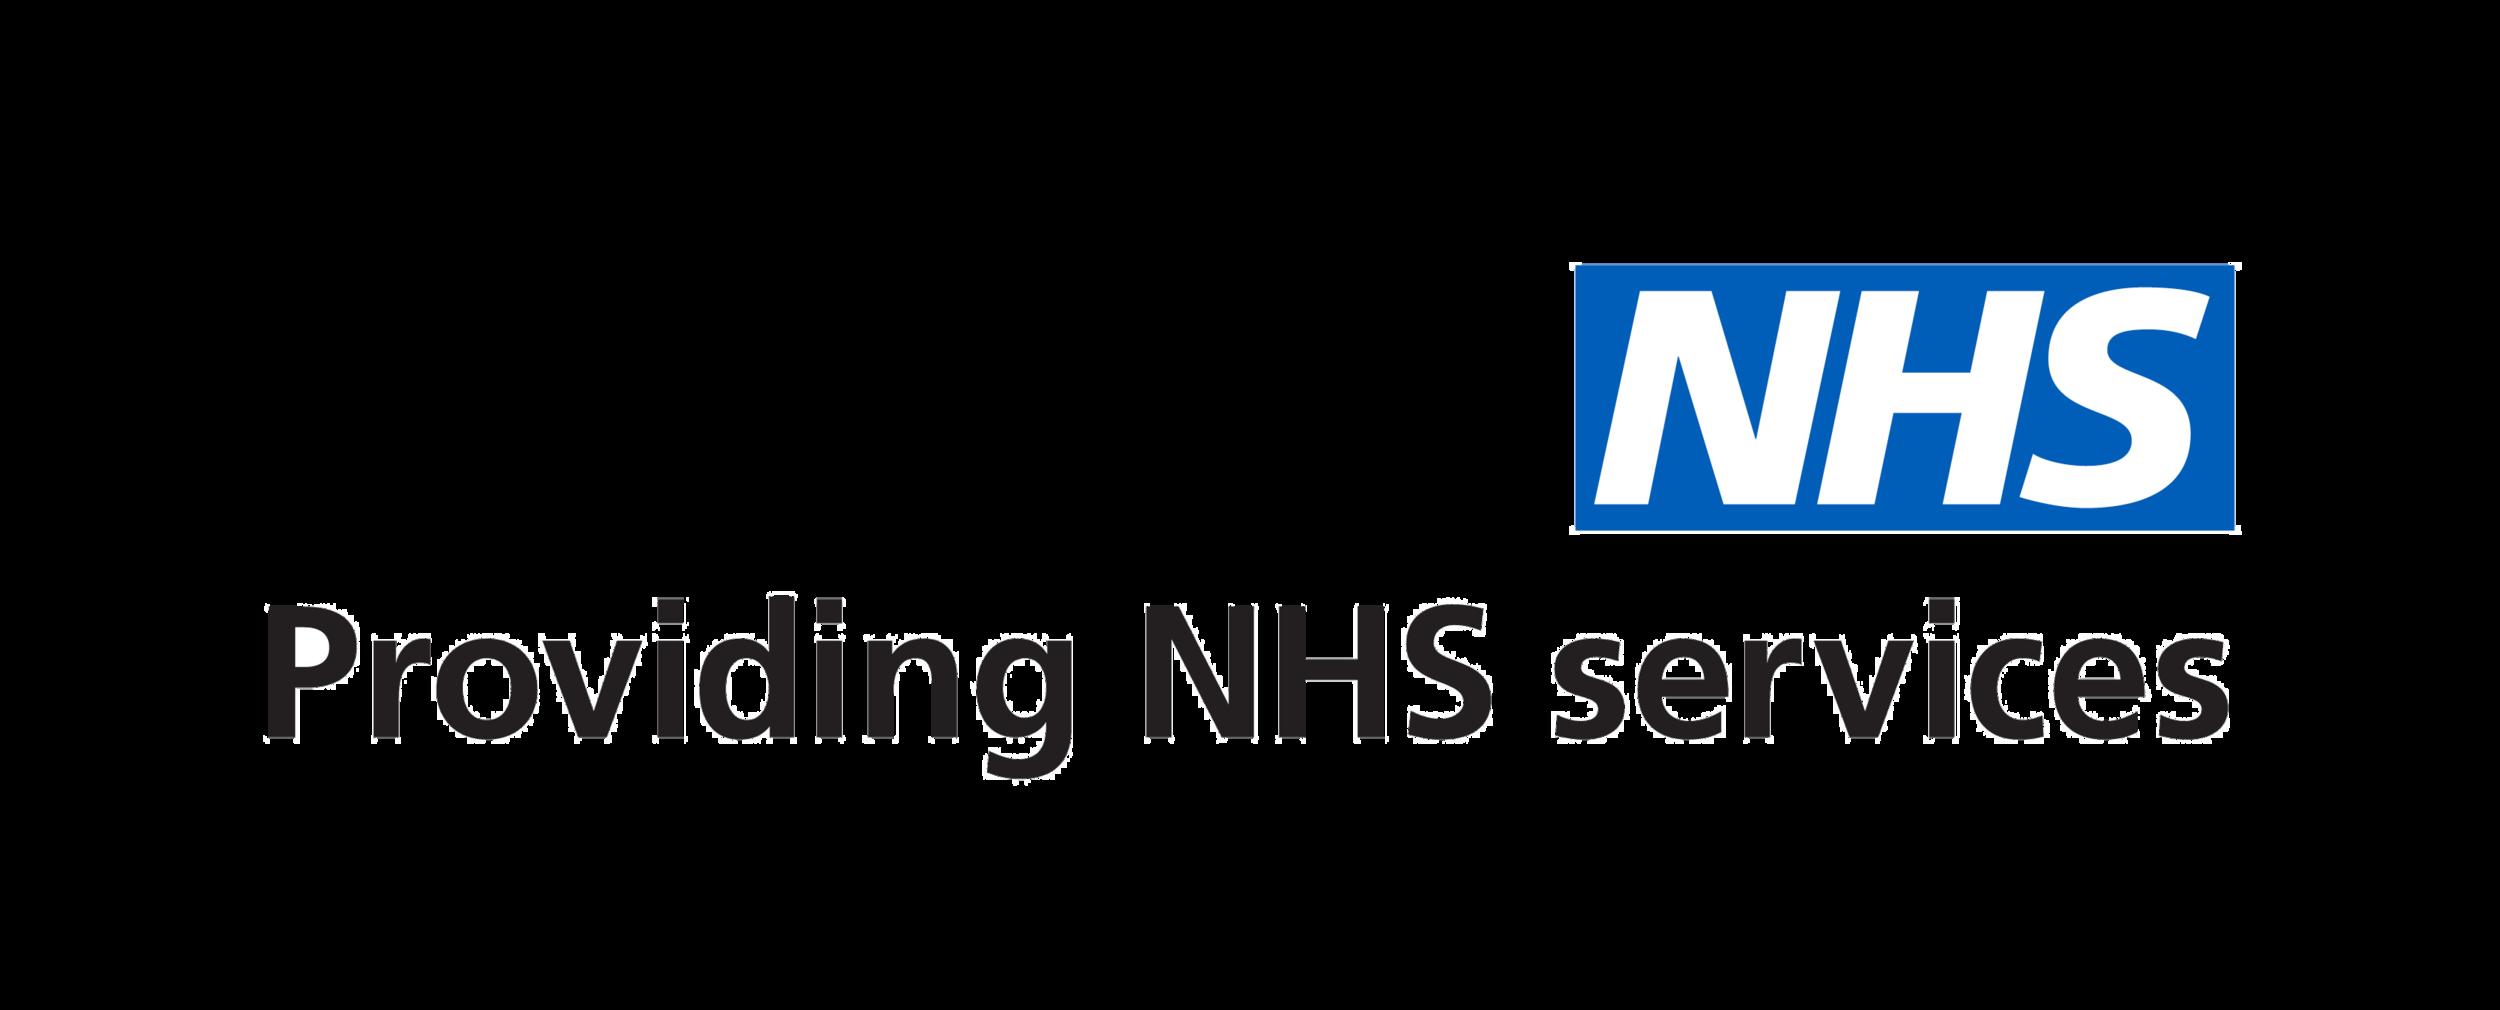 Providing NHS Services Transparent.png